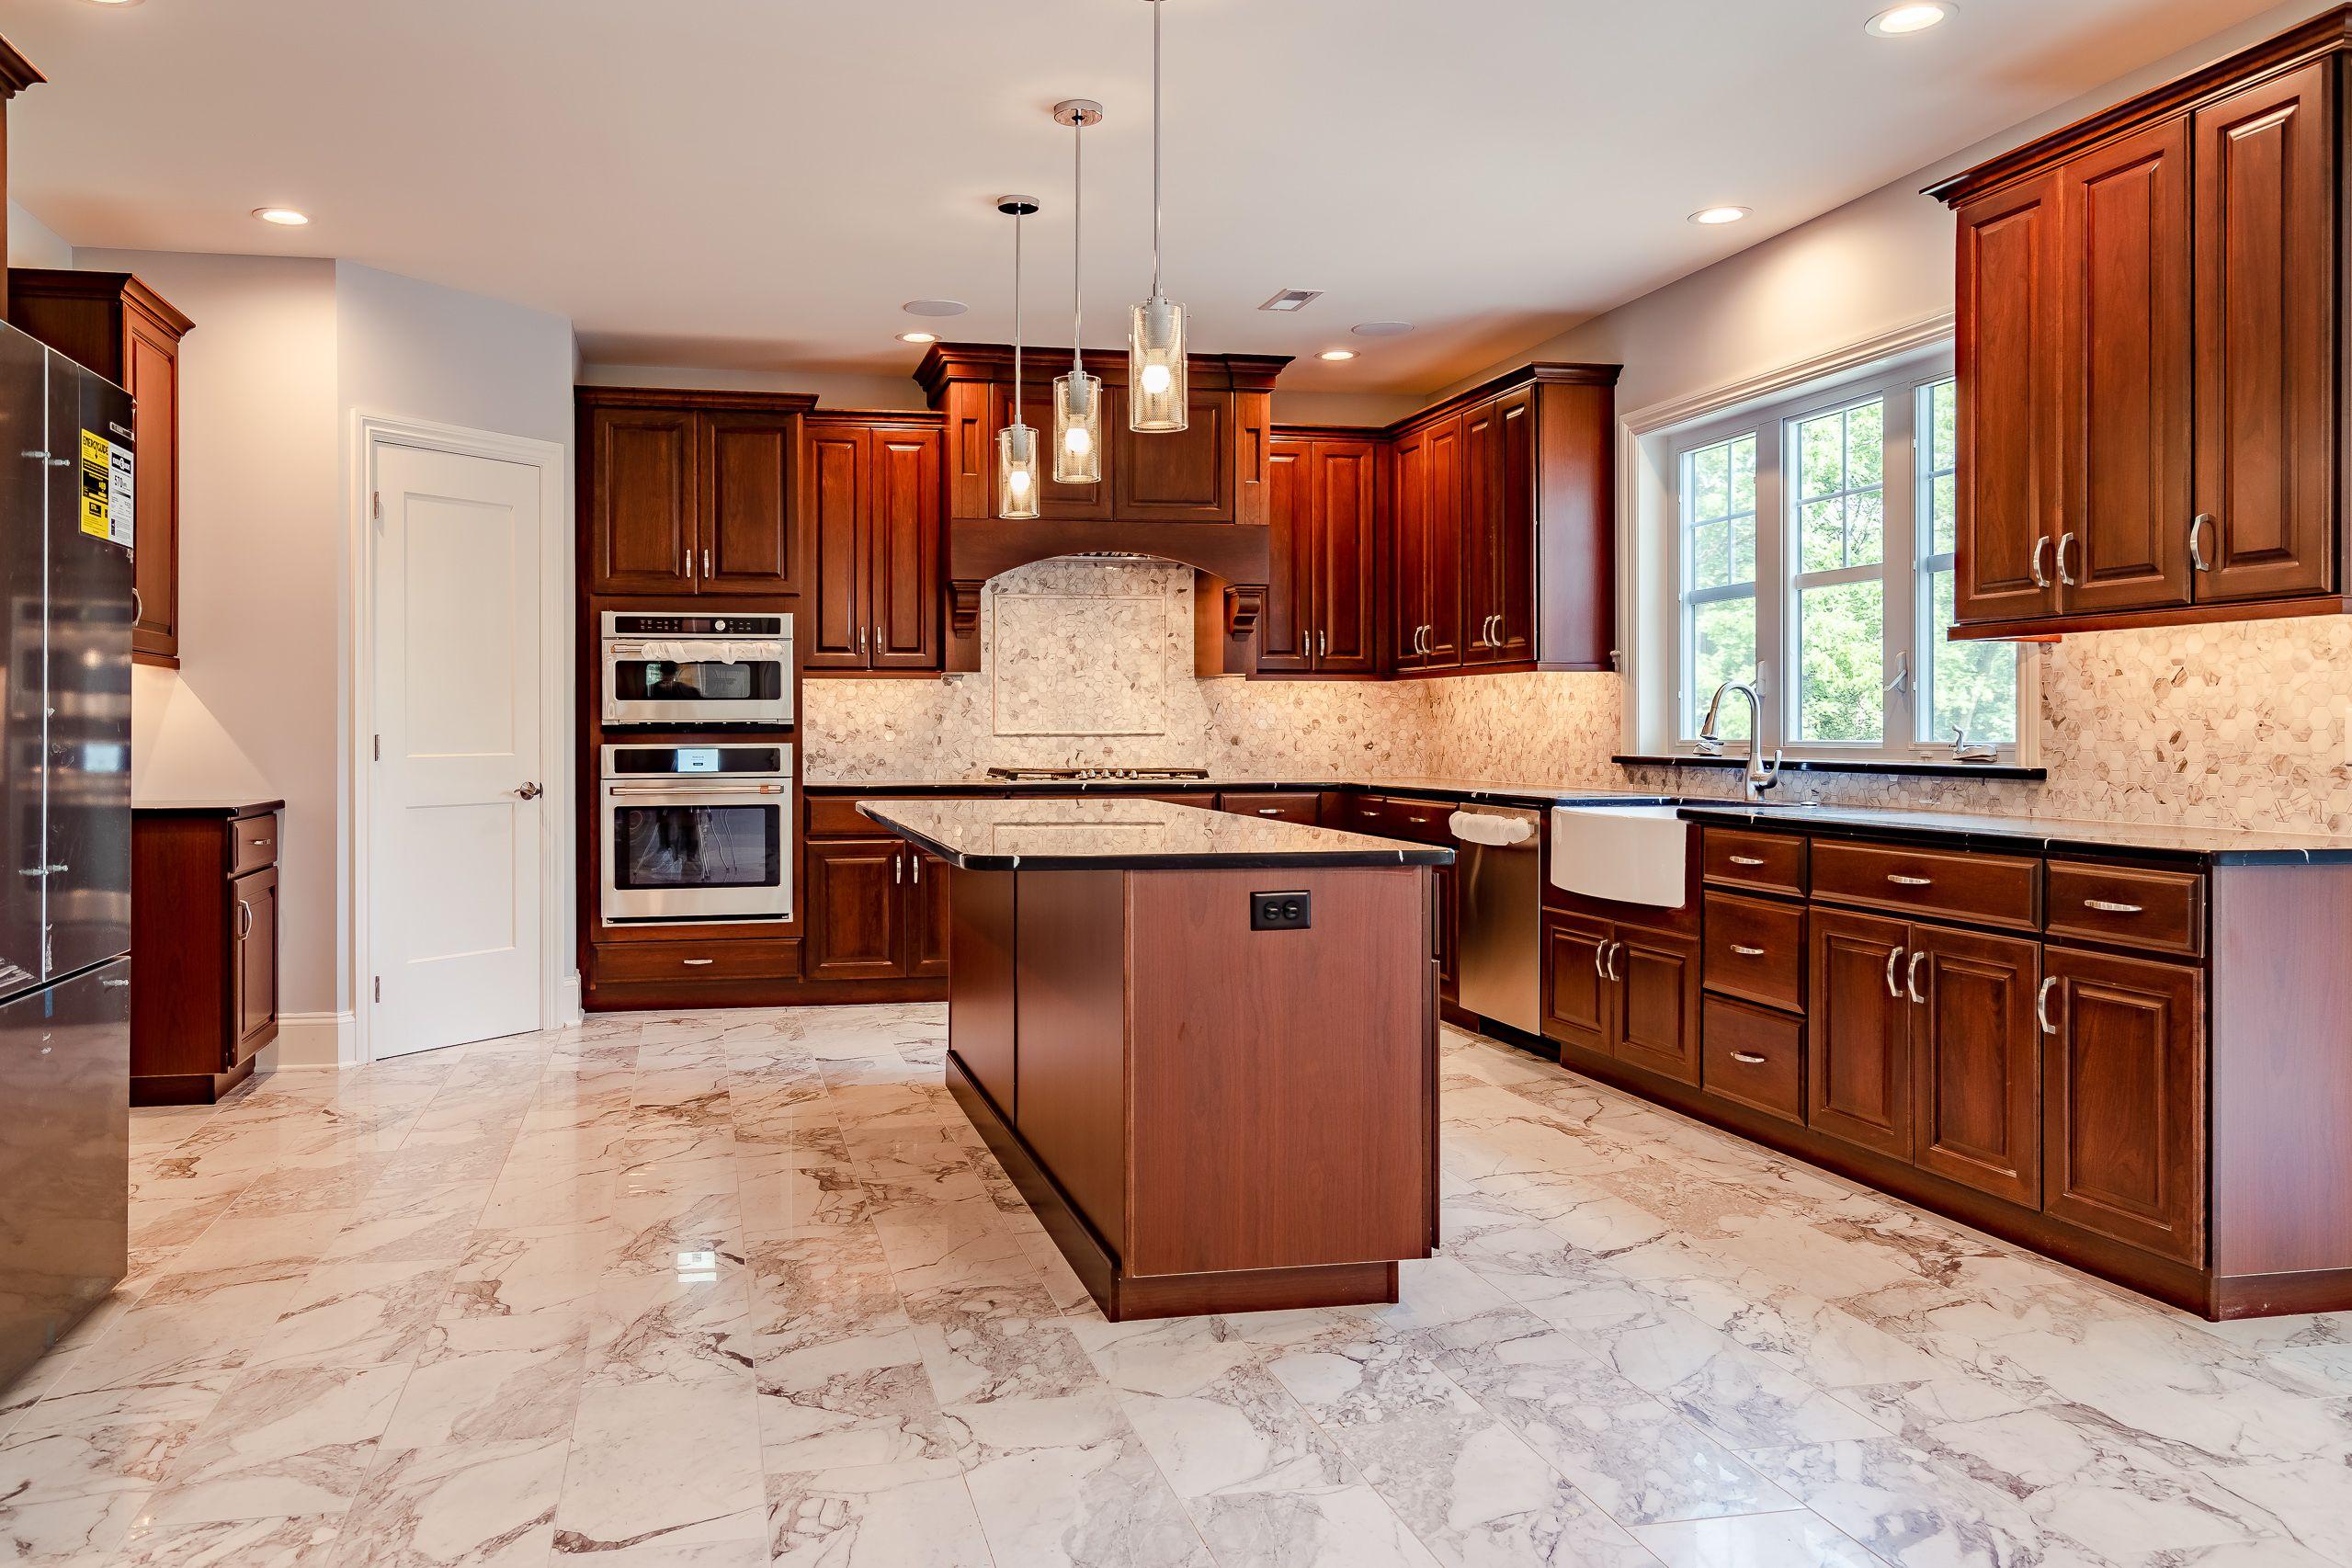 Kitchen featured in The Gwynwood By Cornerstone Premier Homes in Philadelphia, PA